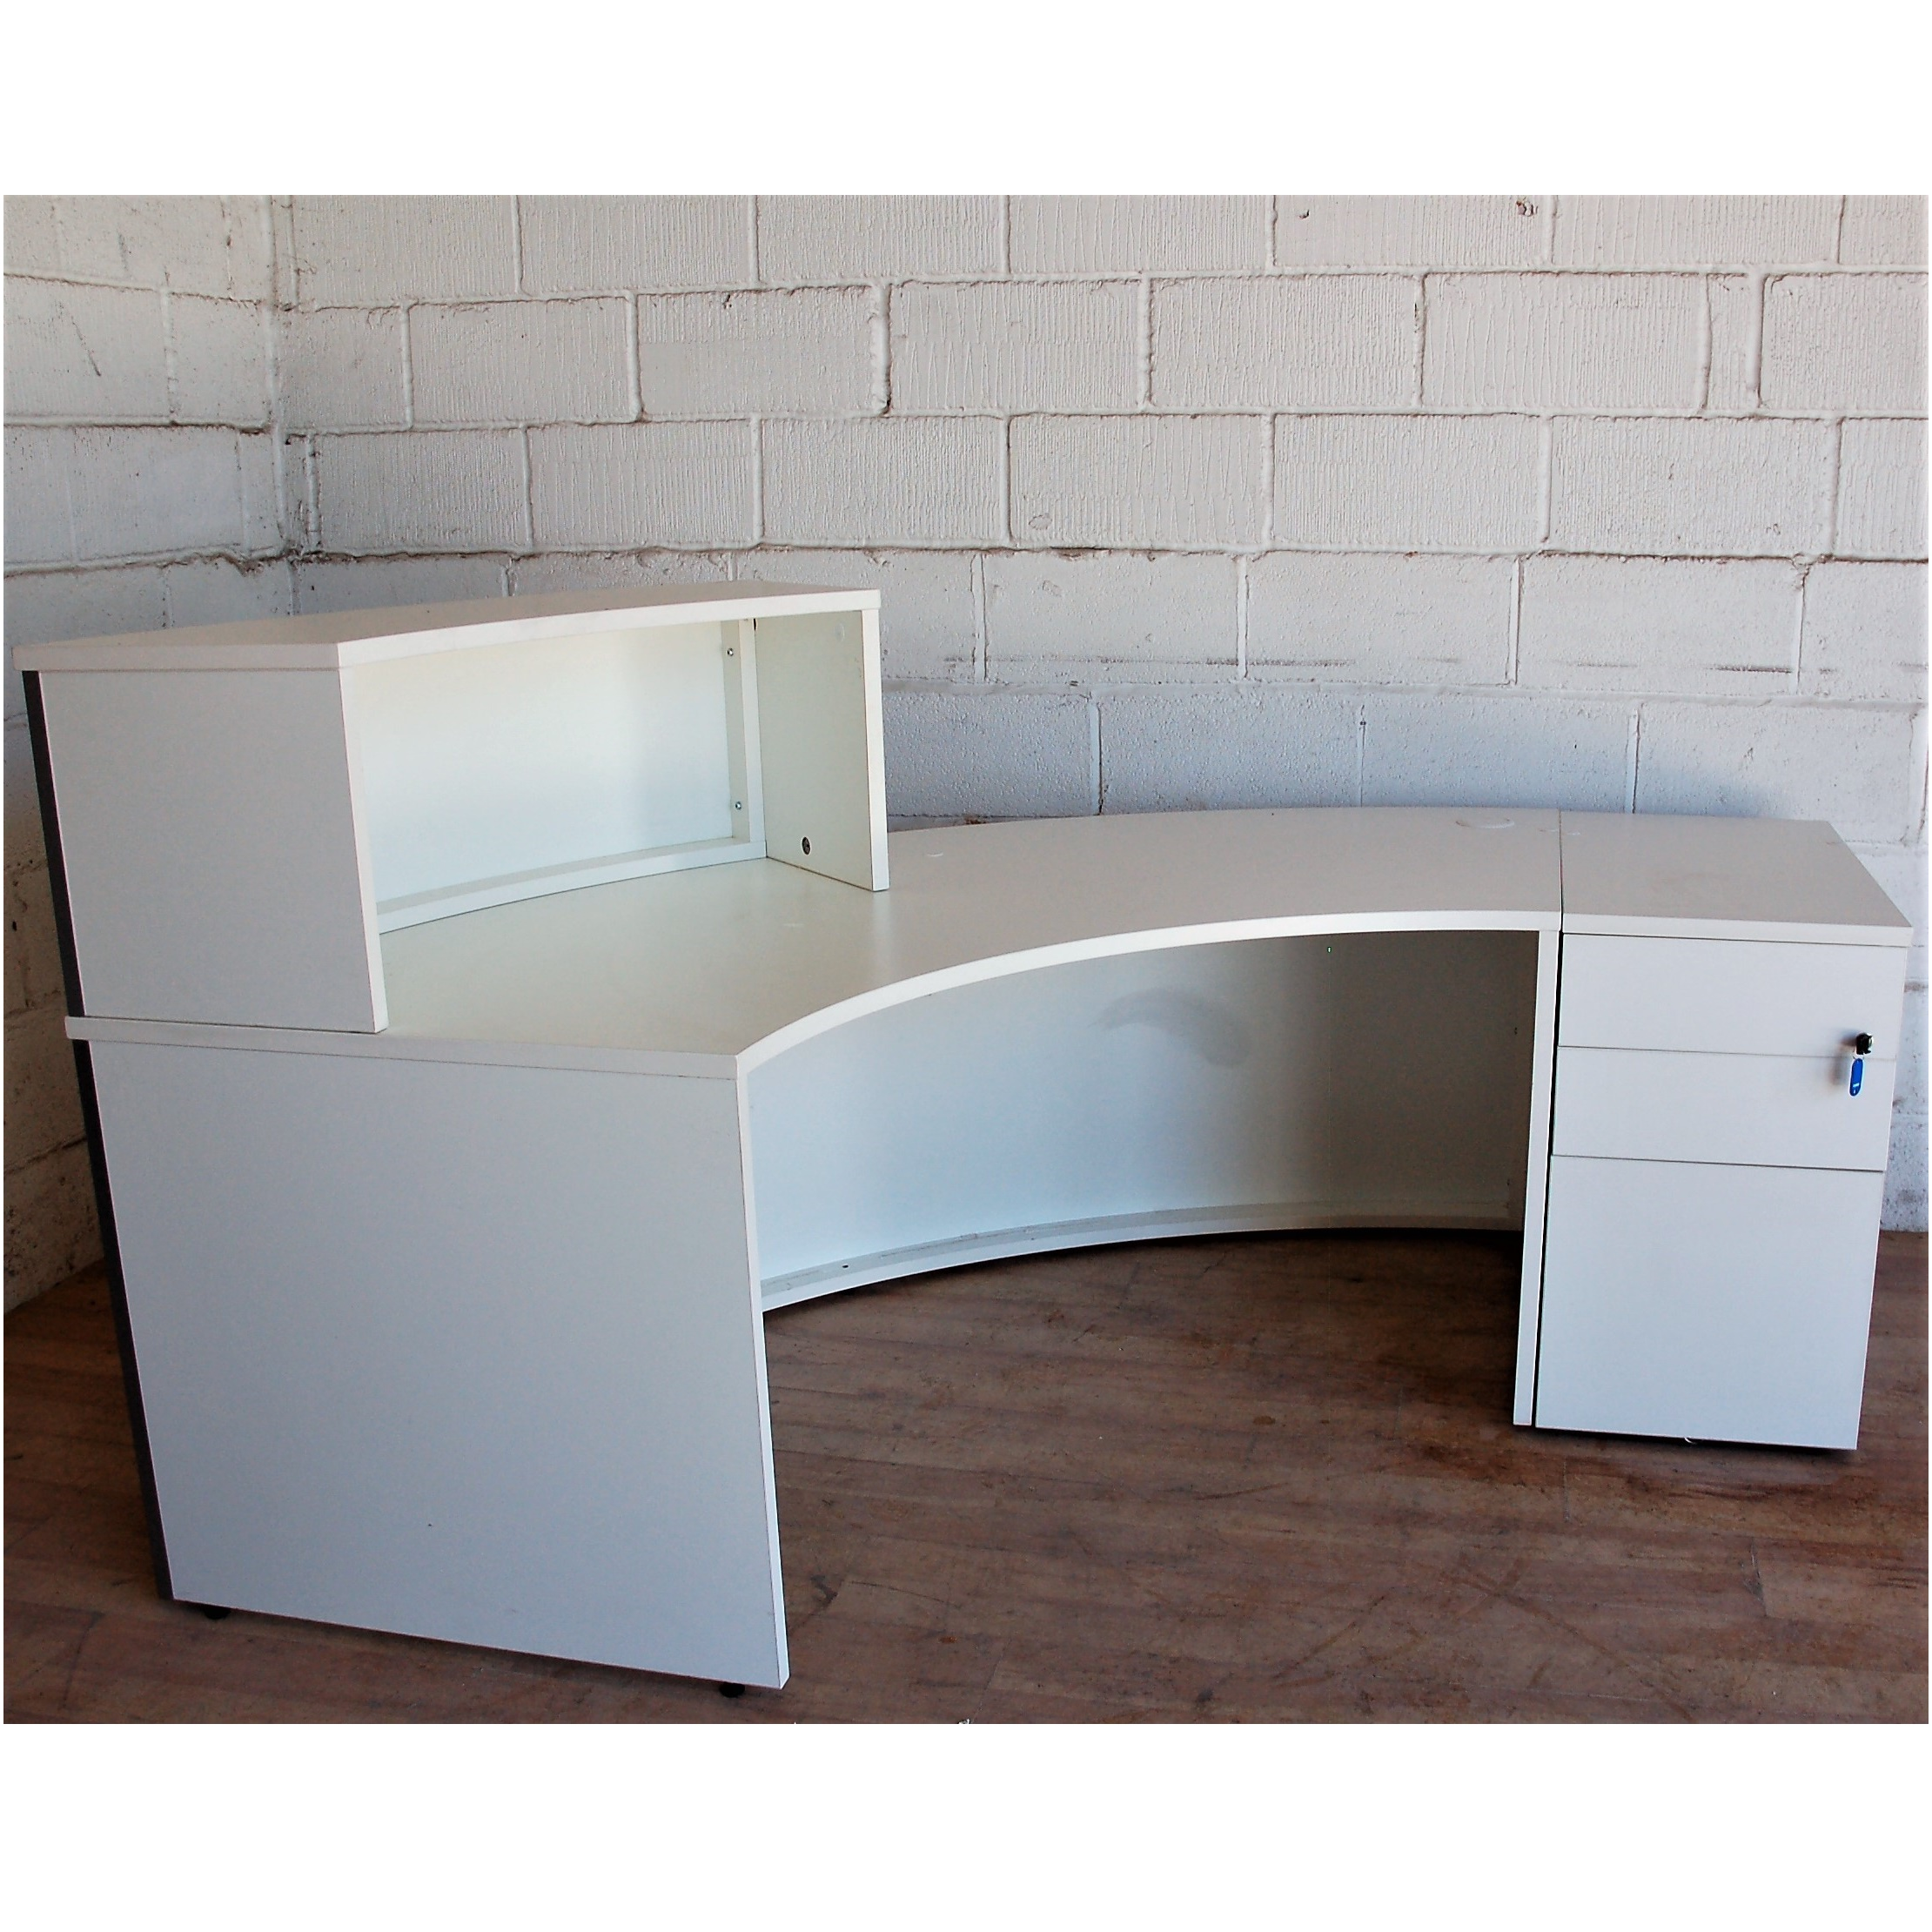 Reception Desk White Curved 13018 | Allard Office Furniture